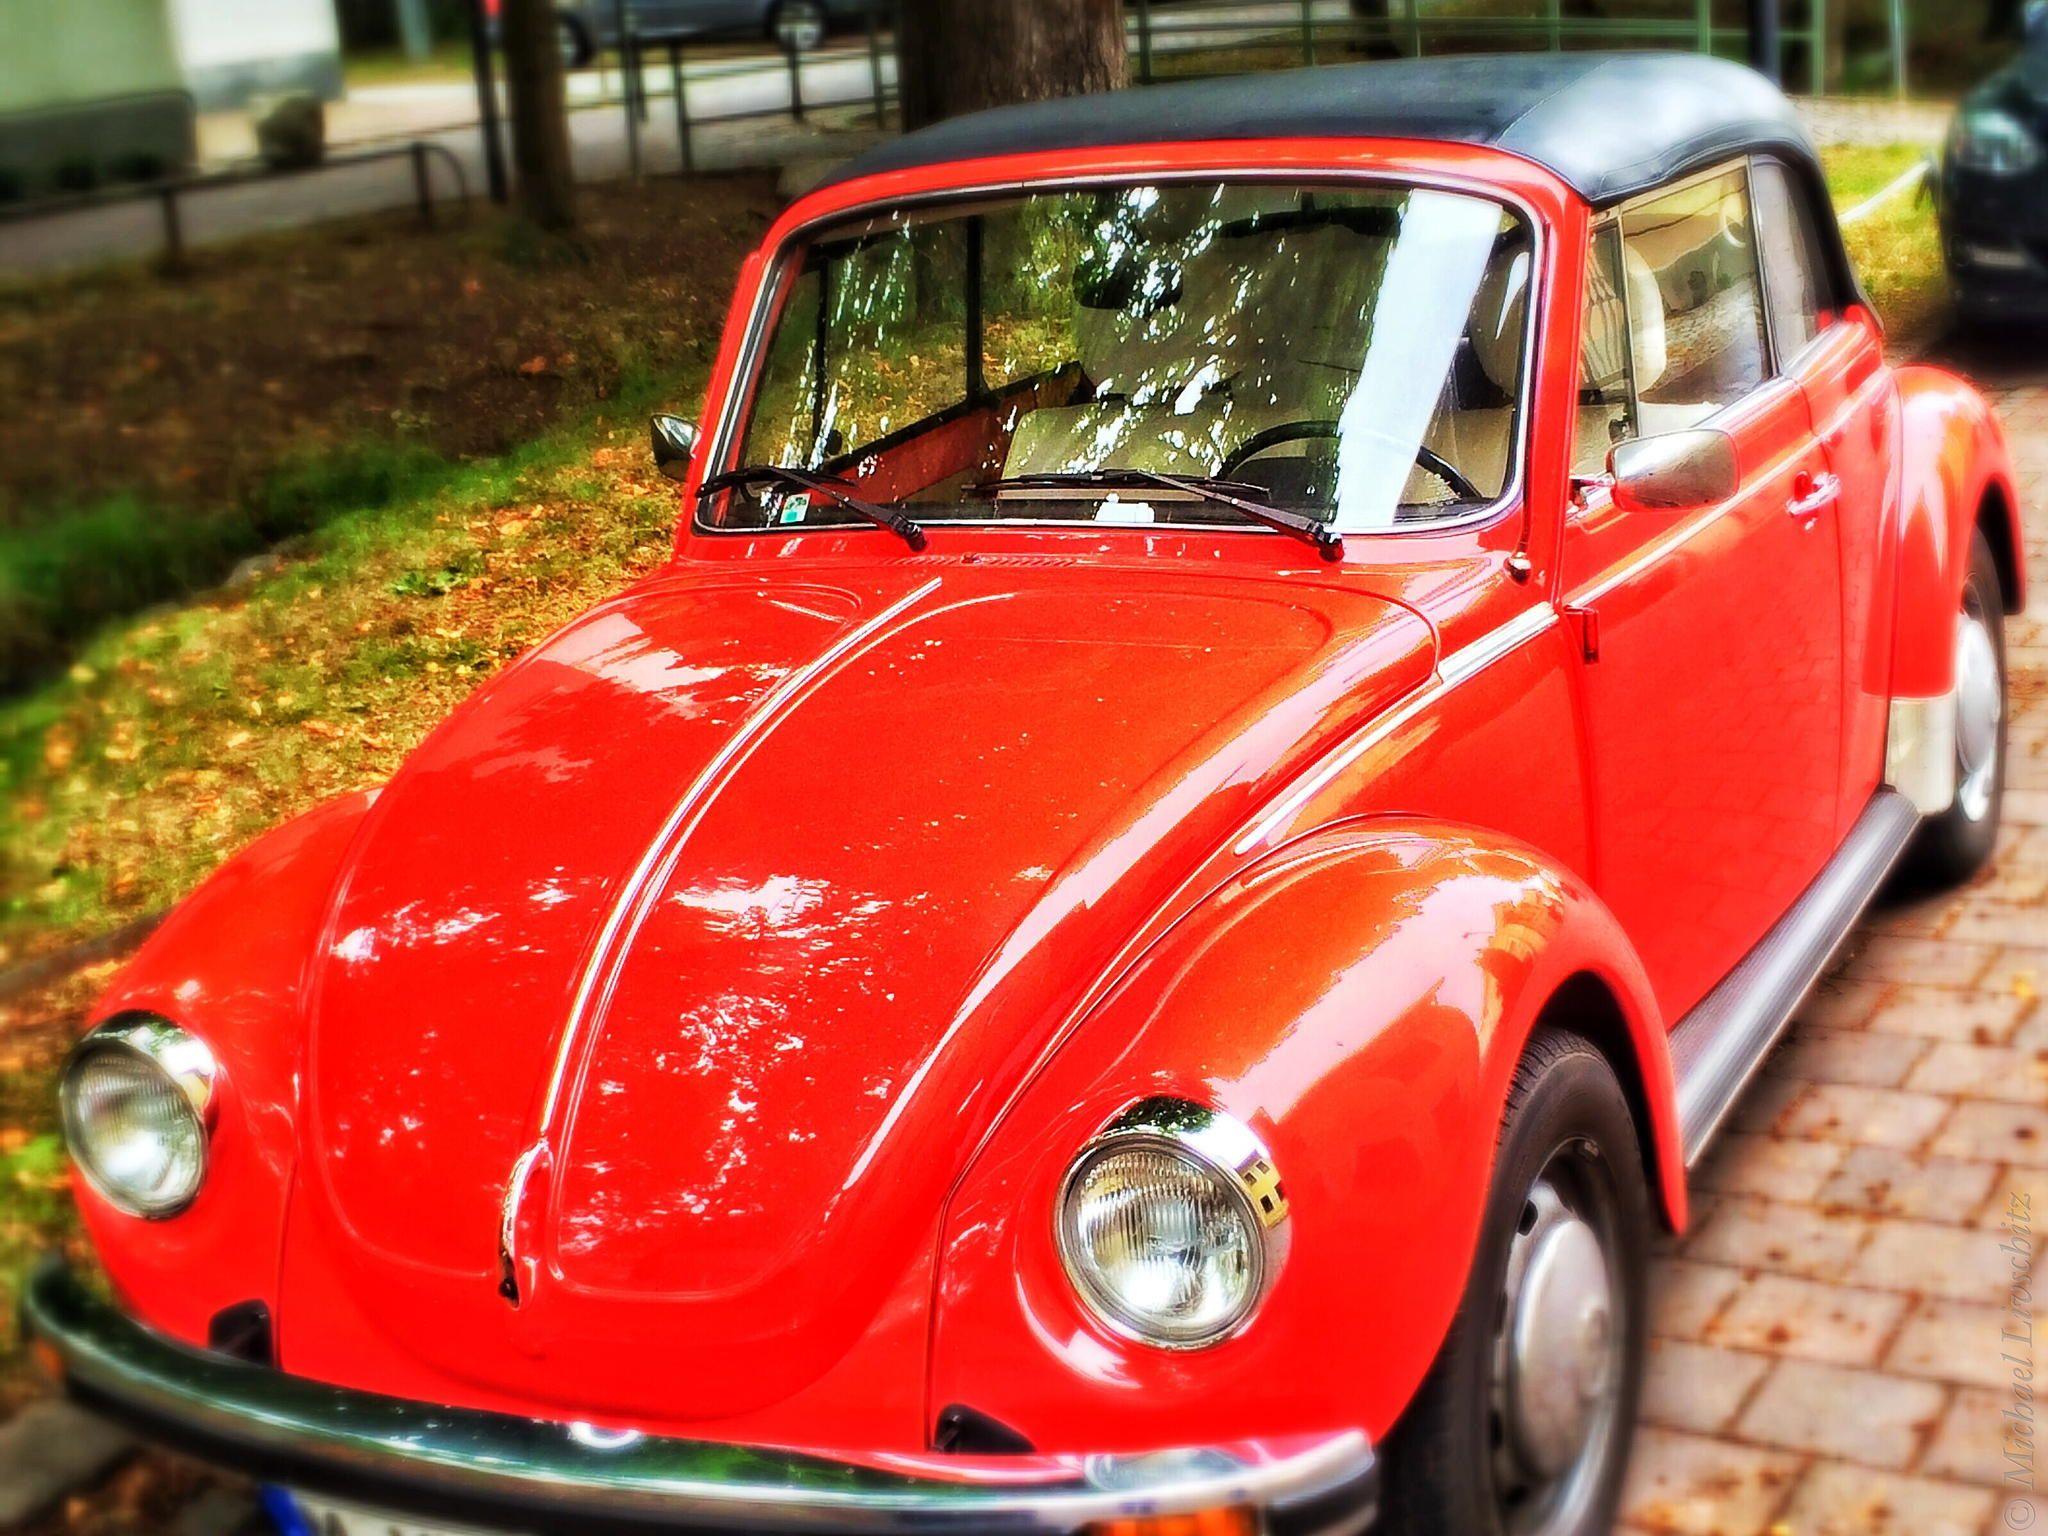 Volkswagen Beetle by Michael Livschitz on 500px/ auto, cabriolet, car, munich, perlach, retro, volkswagen, volkswagen beetle, vw käfer cabrio, vw cabrio